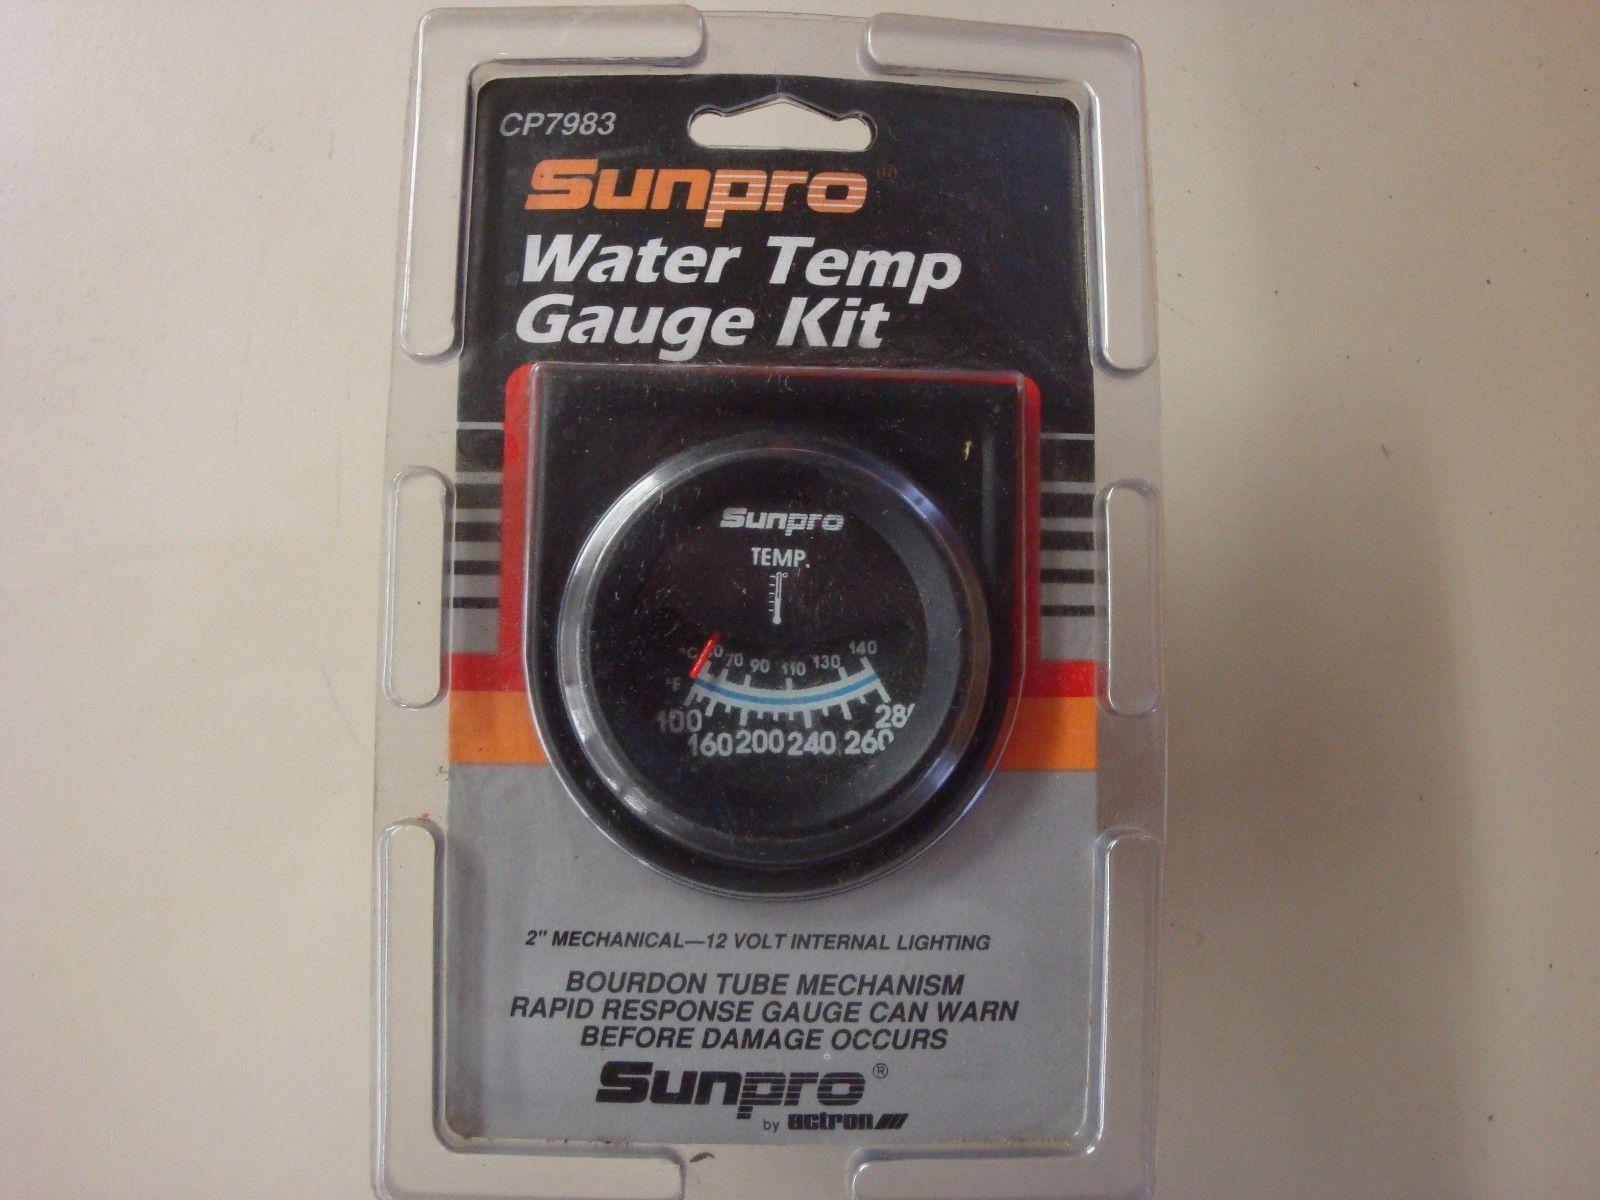 hight resolution of sunpro cp7983 water temperature gauge kit 2 u201d mechanical 100 280f sunpro temperature gauge wiring